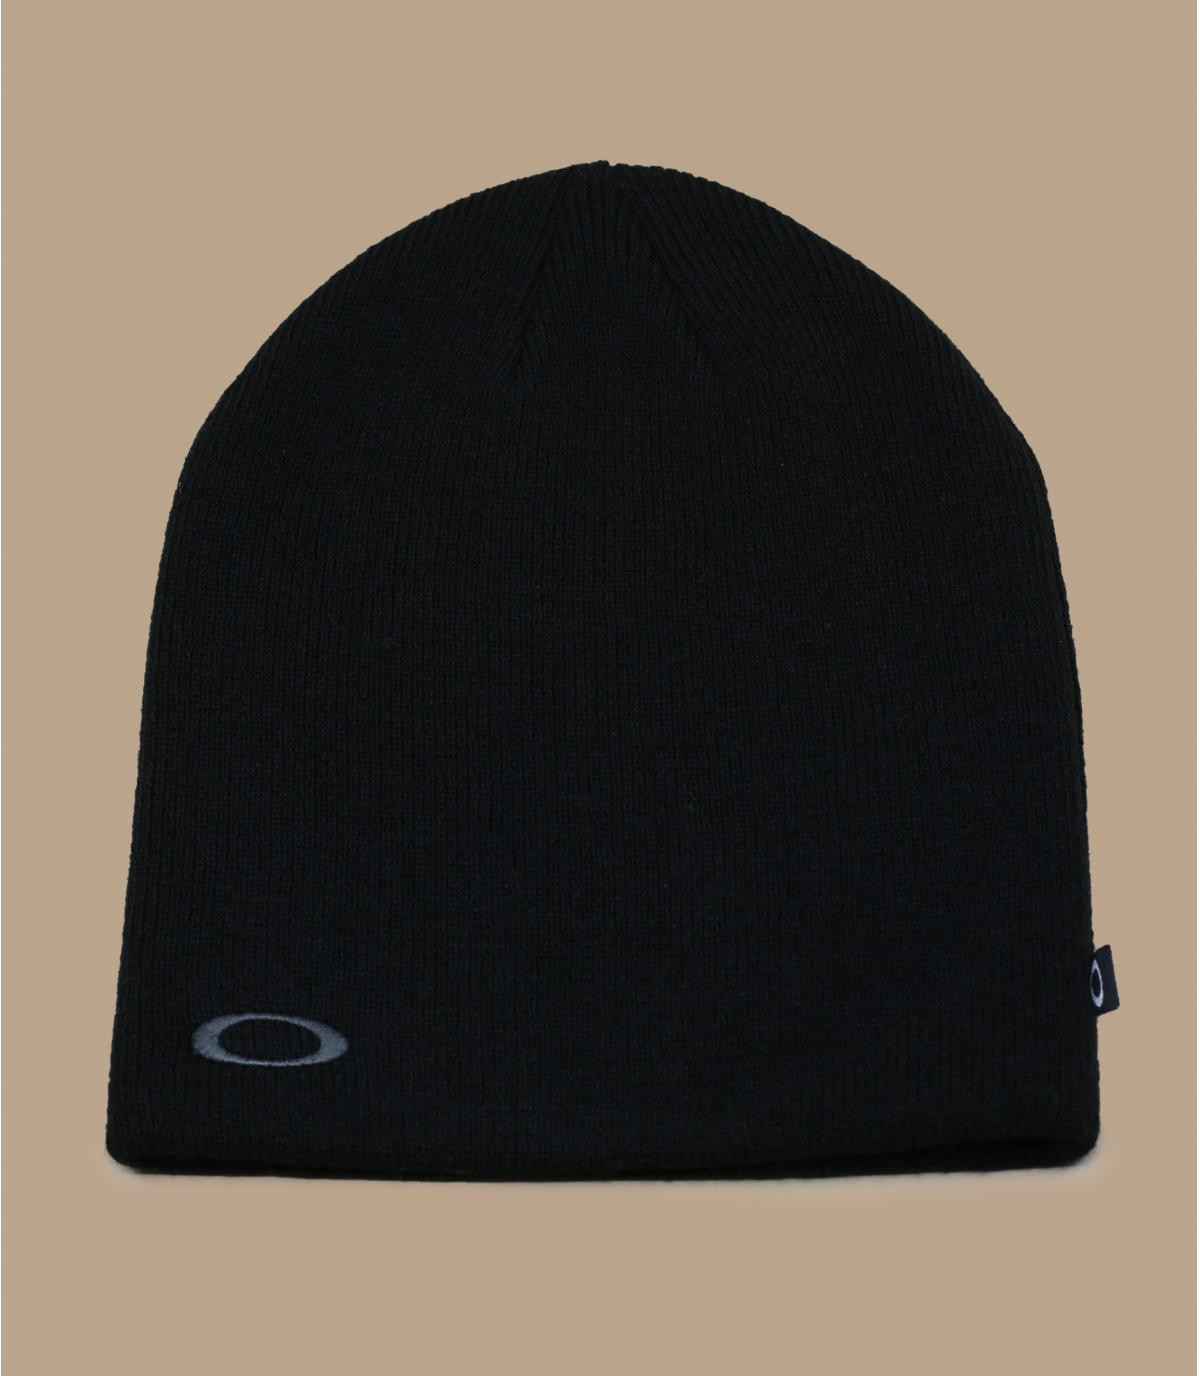 black Oakley beanie.